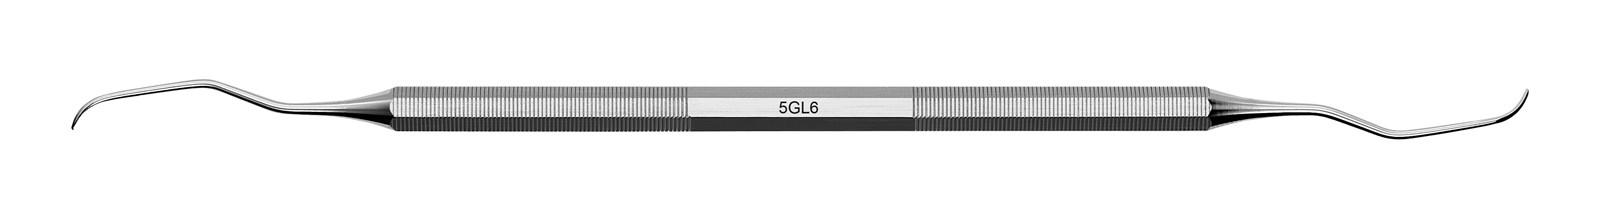 Kyreta Gracey Deep - 5GL6, ADEP světle modrý